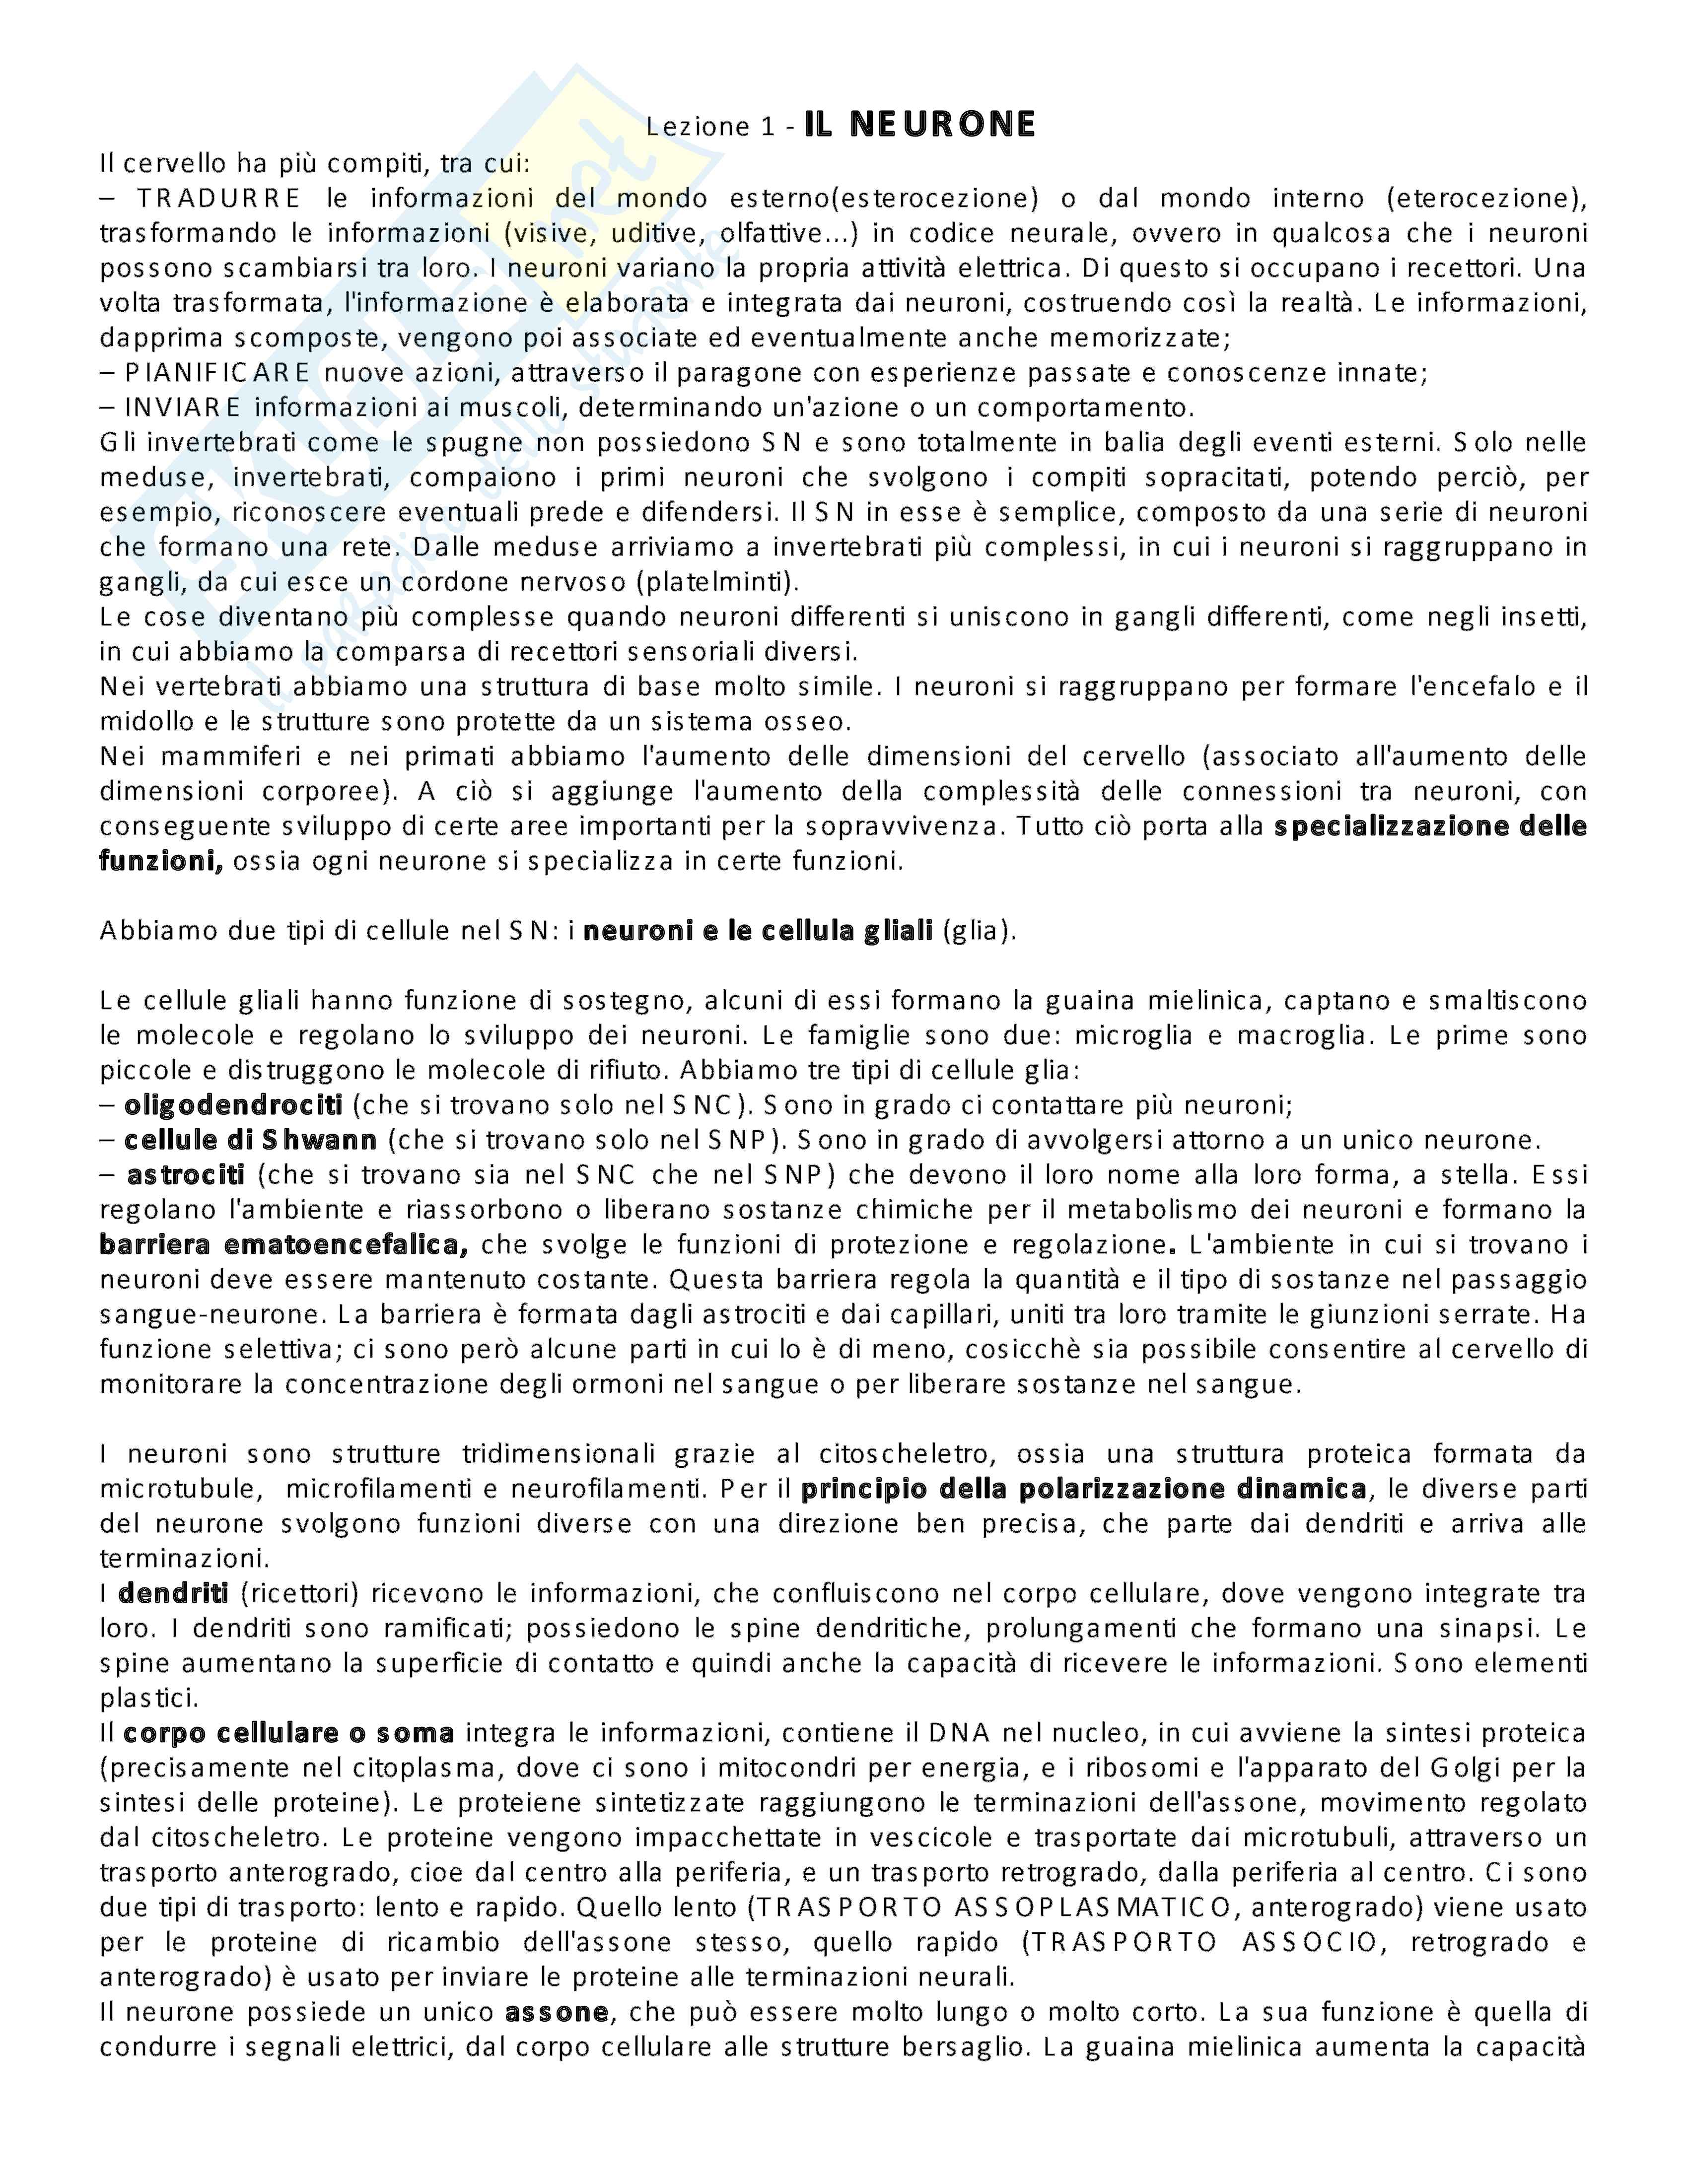 Appunti lezione di Neuroscienze - Università di Torino